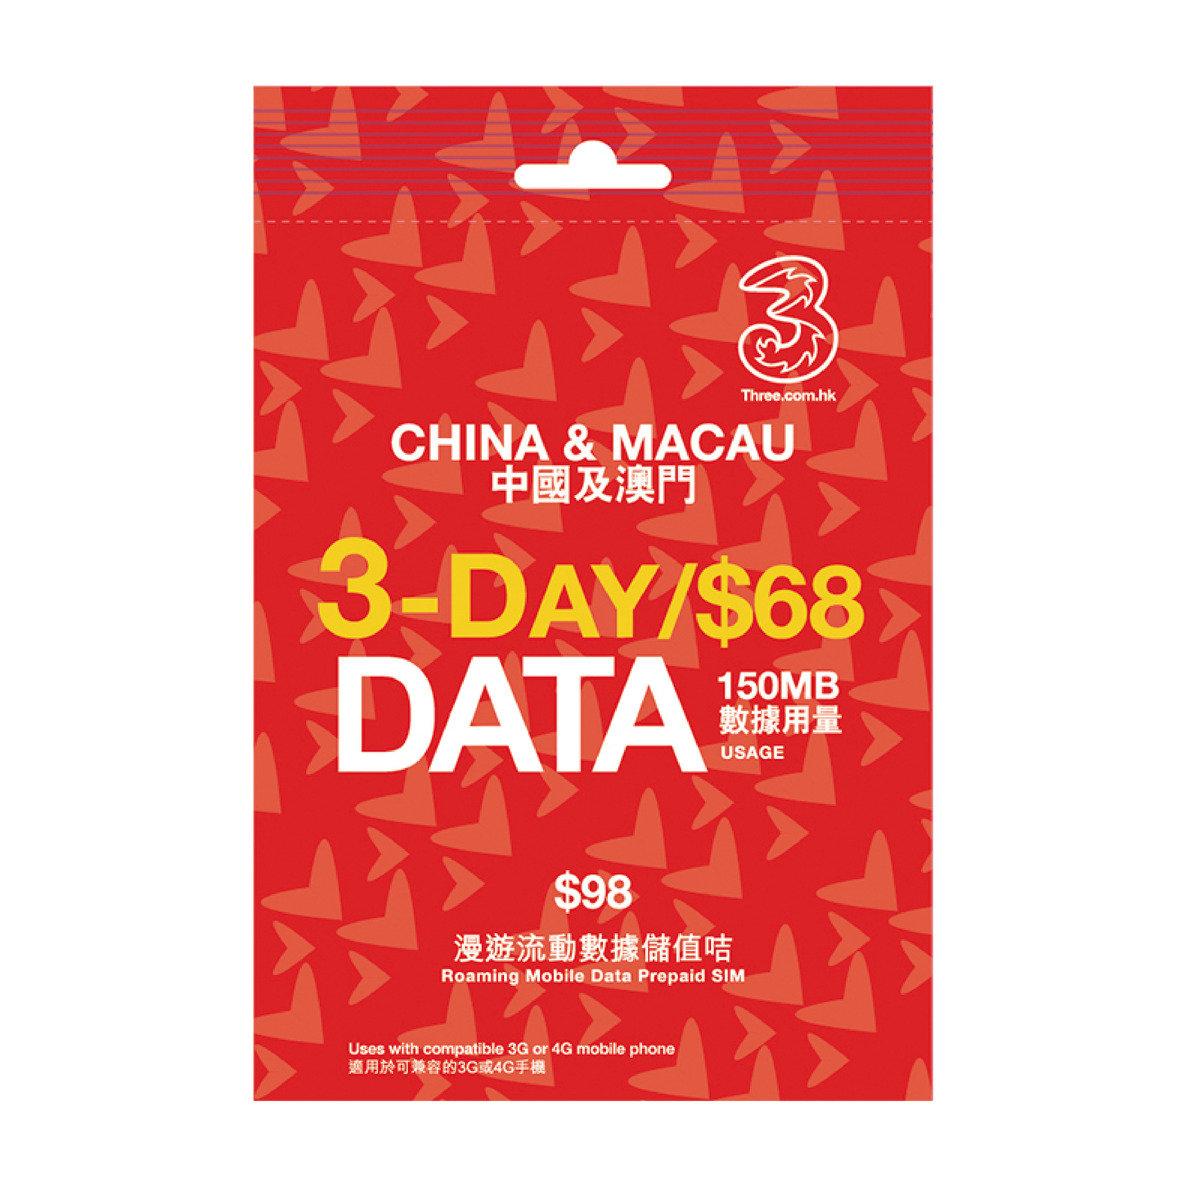 $98 LTE 漫遊數據儲值咭(中國澳門) (expiry date:31-12-2017)